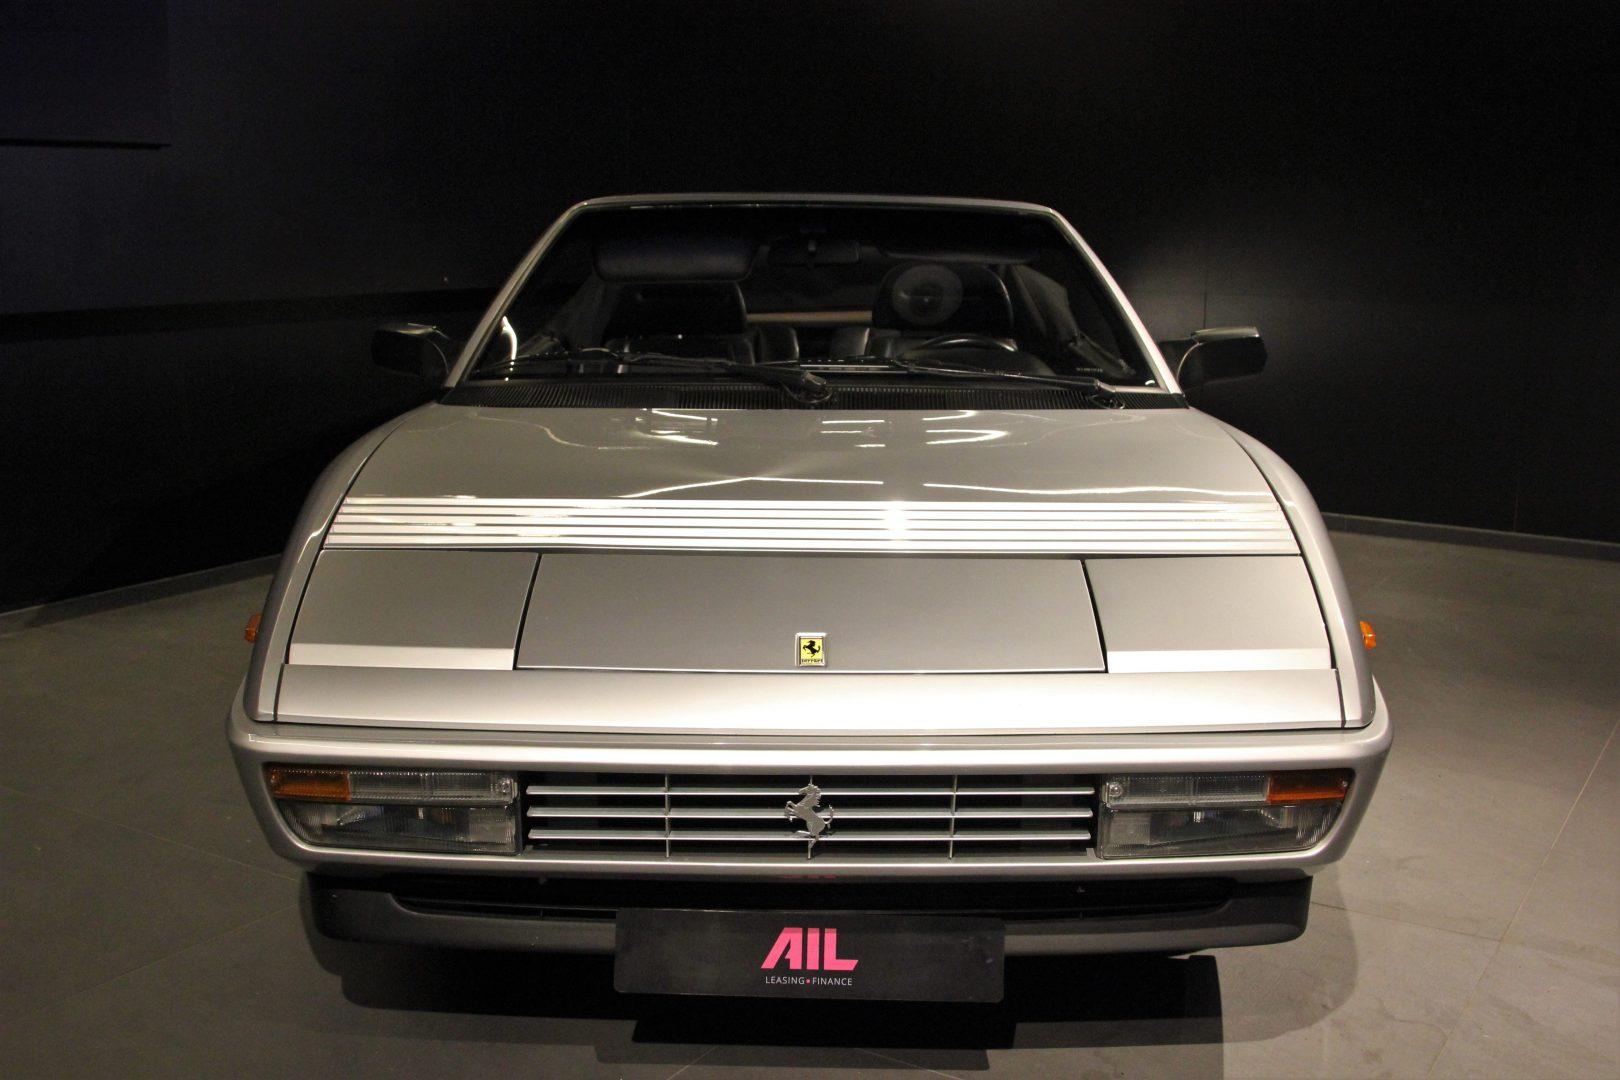 AIL Ferrari Mondial T Cabriolet 3,4 V8 2